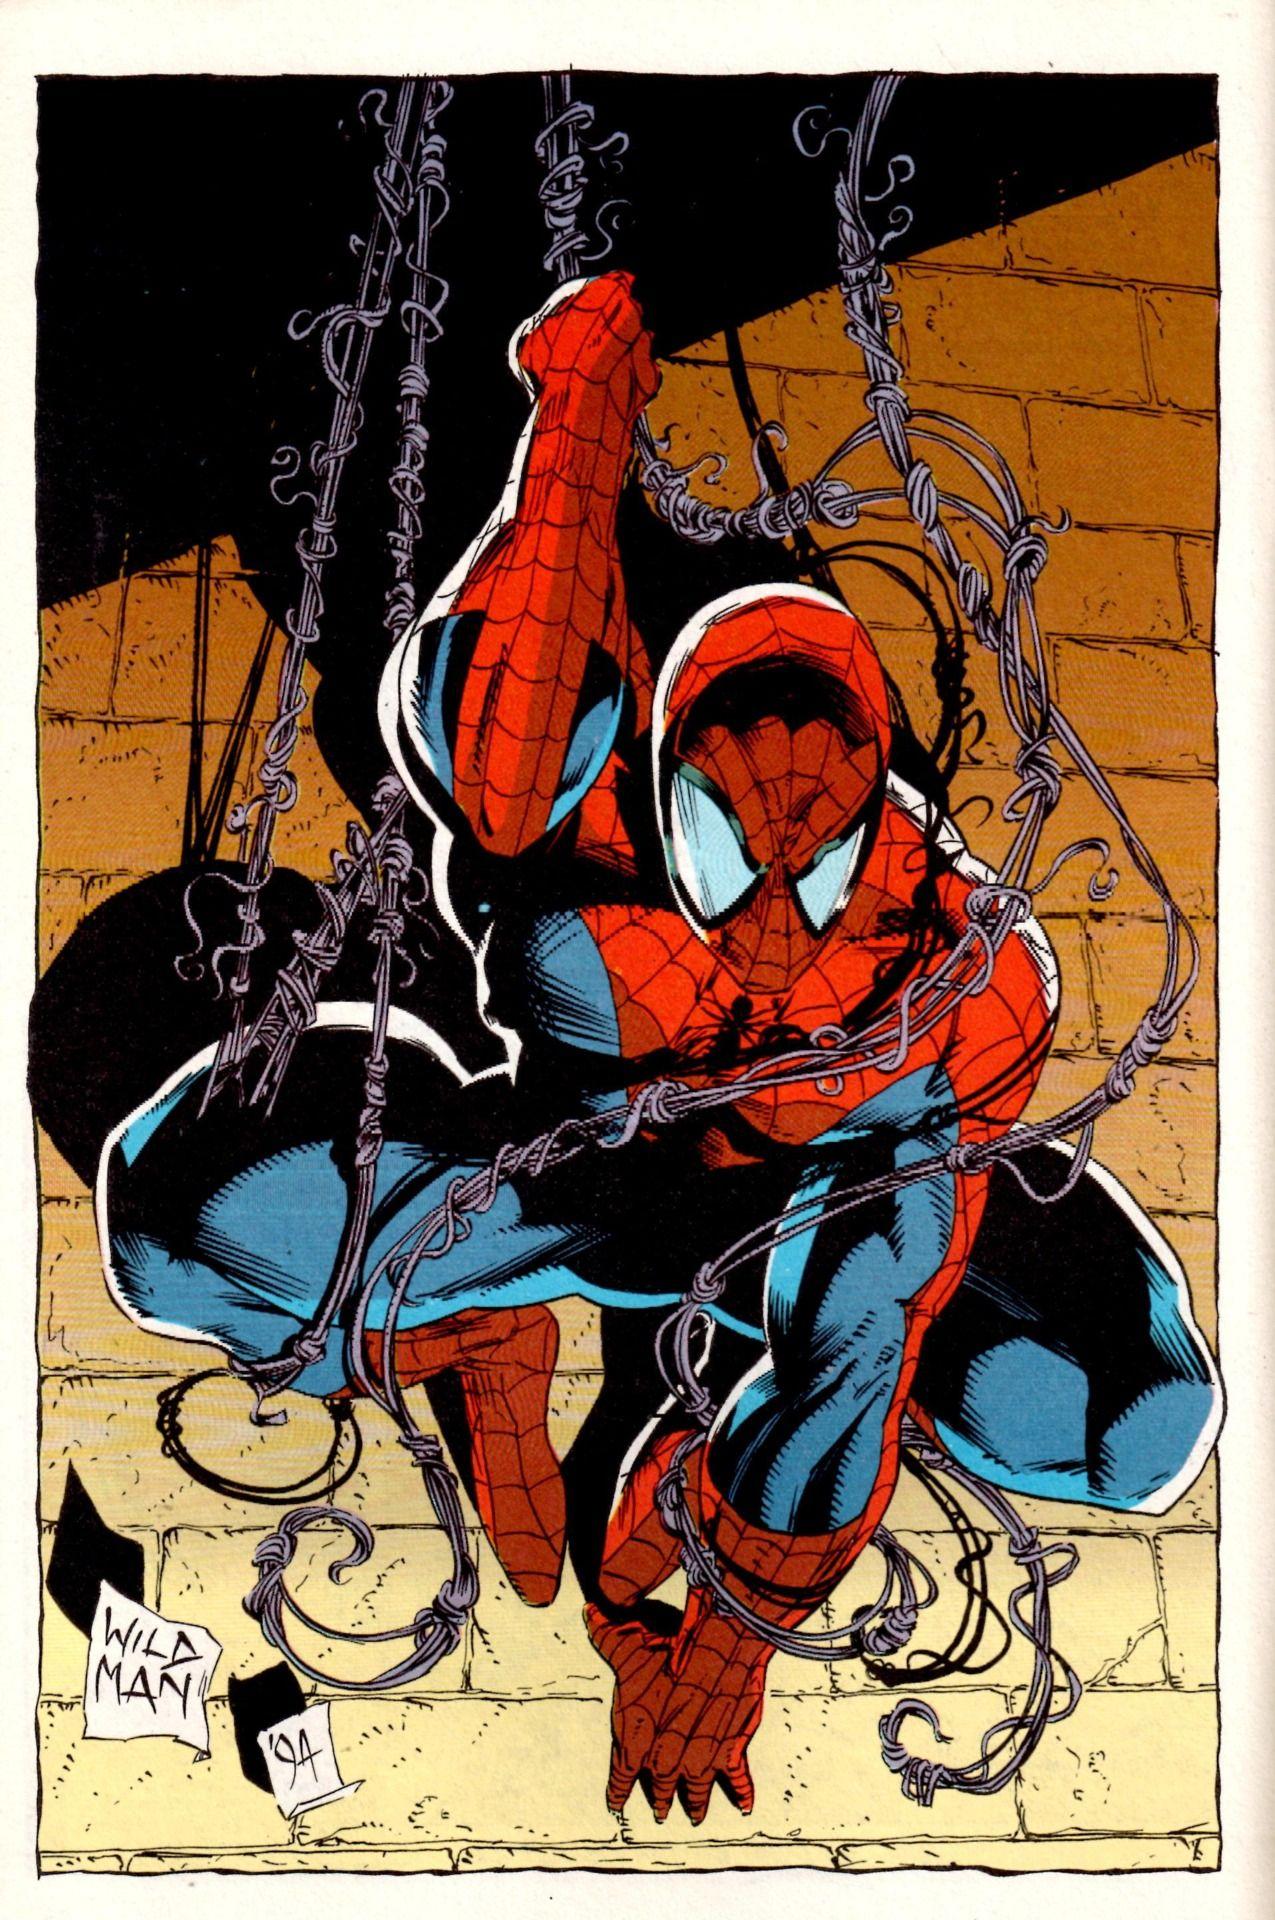 #Spiderman #Fan #Art. (Spiderman) By: Todd McFarlane. (THE * 5 * STAR * AWARD * OF * ÅWESOMENESS!!!™)